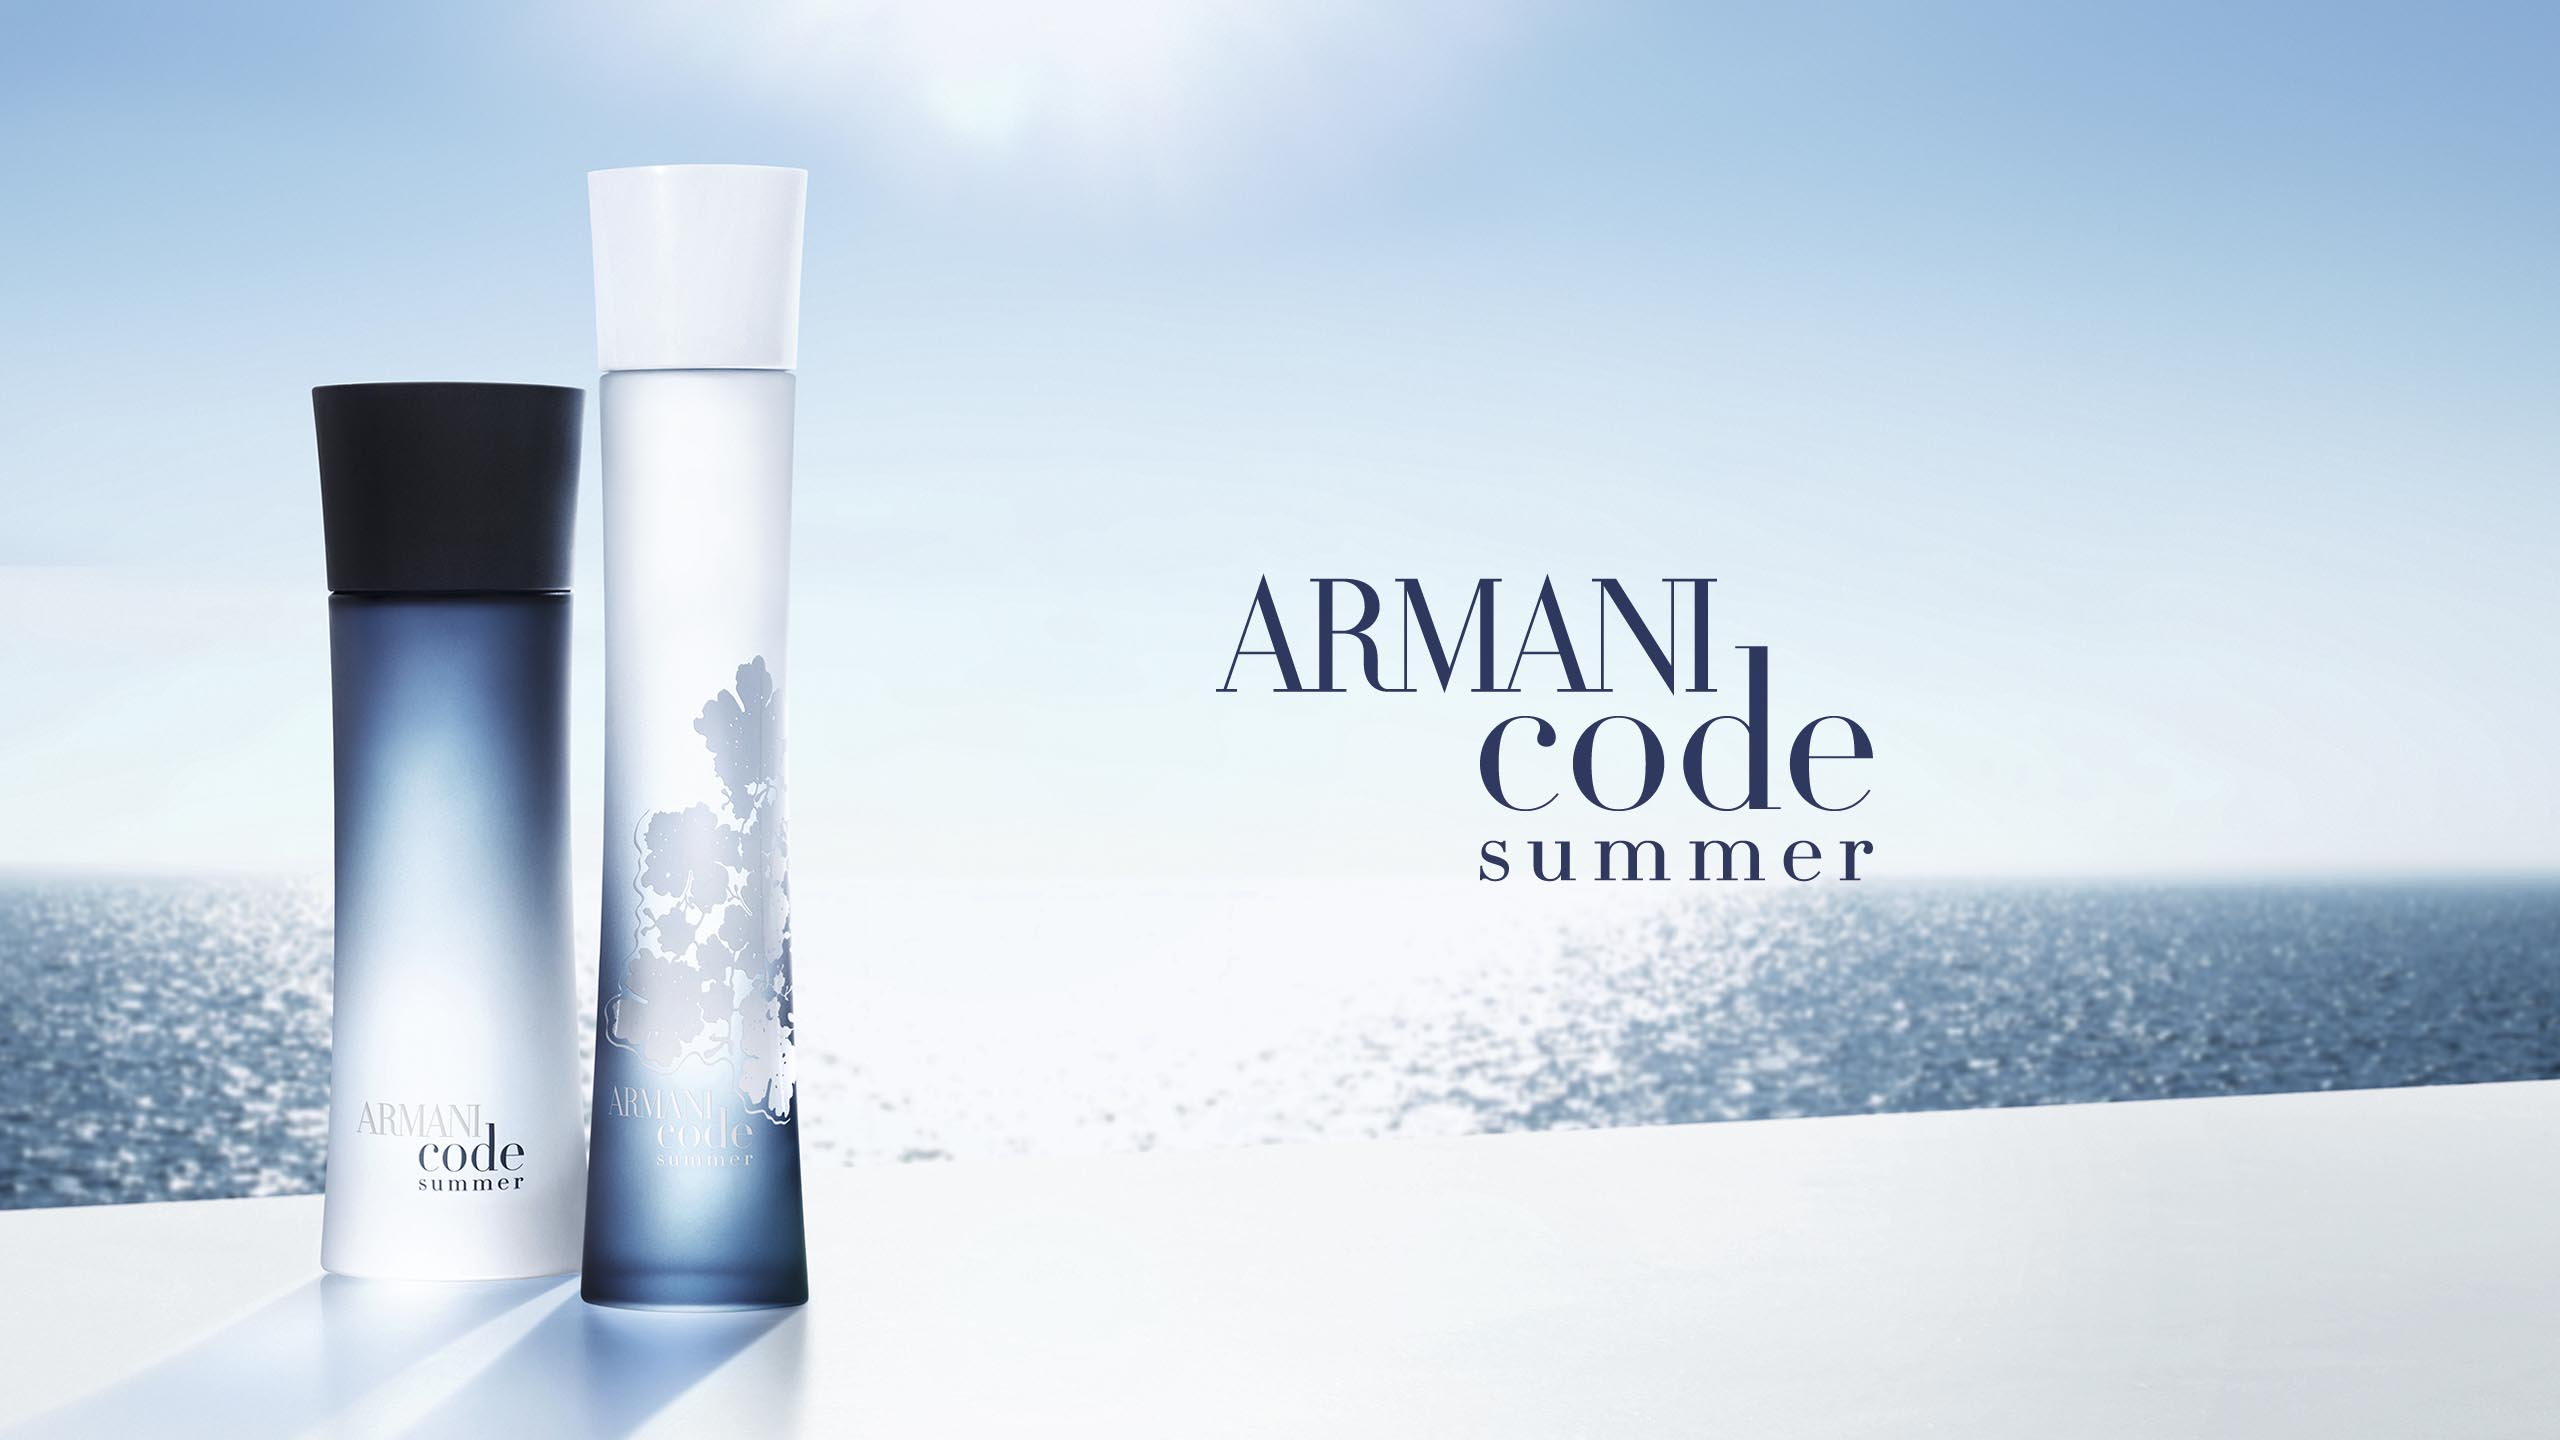 Giorgio Armani, Armani Code, Armani Diamonds